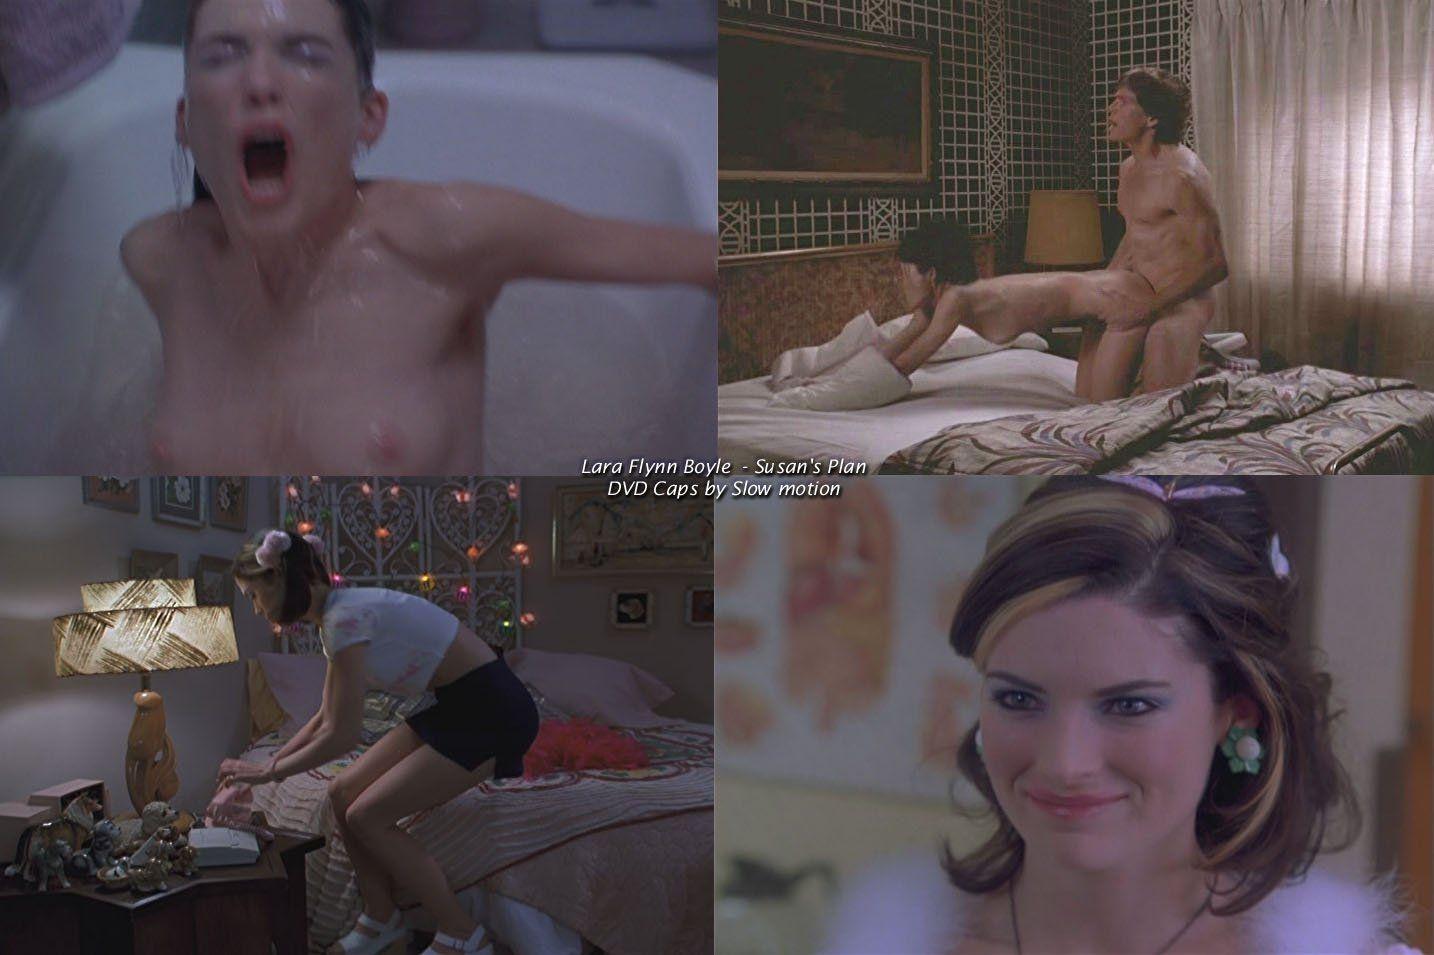 Lara flynn boyle nake